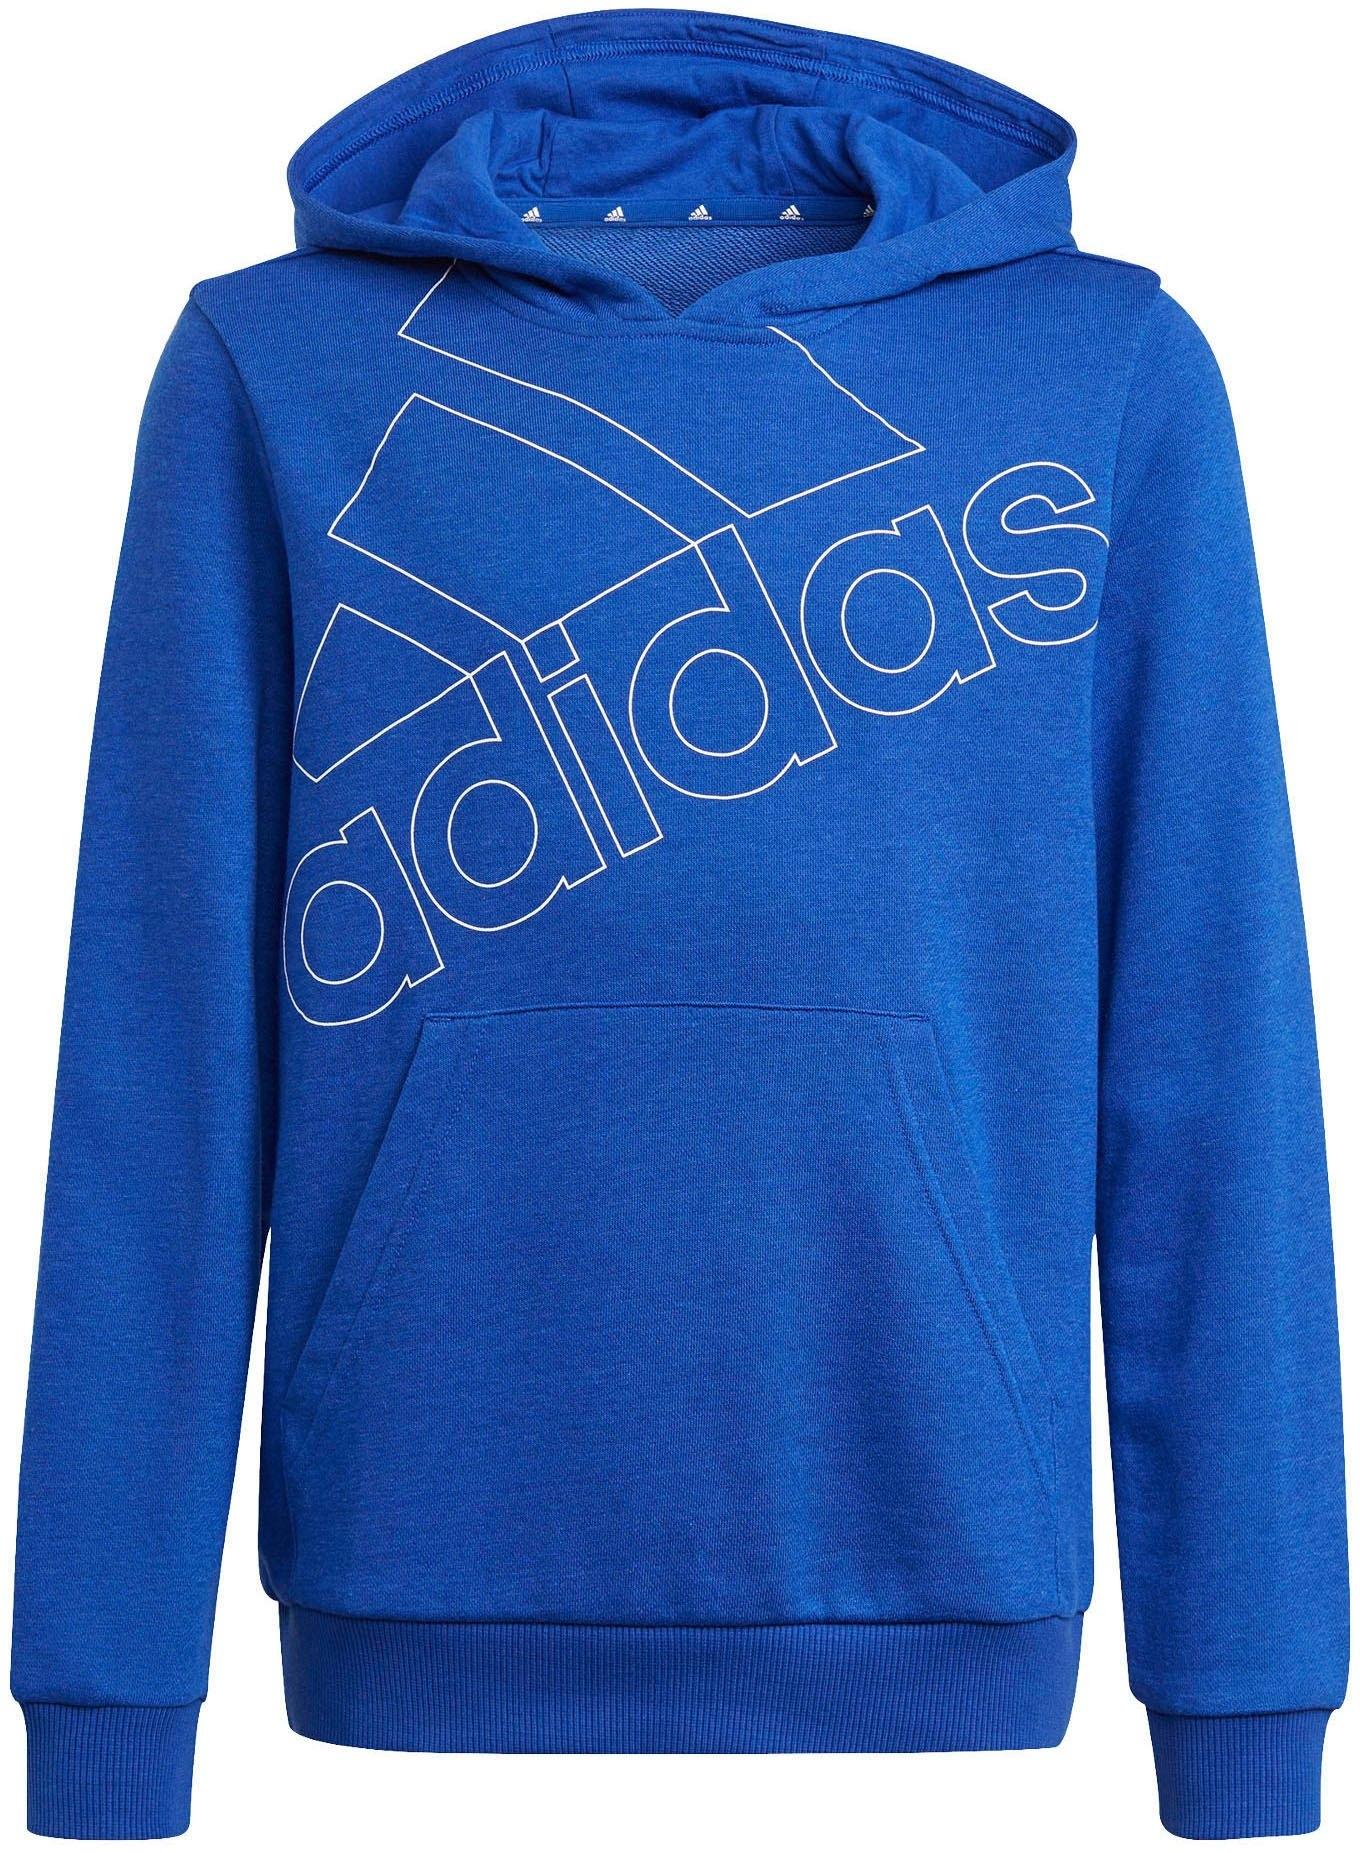 adidas Performance hoodie ADIDAS BOYS ESSENTIALS LOGO HOODIE veilig op otto.nl kopen